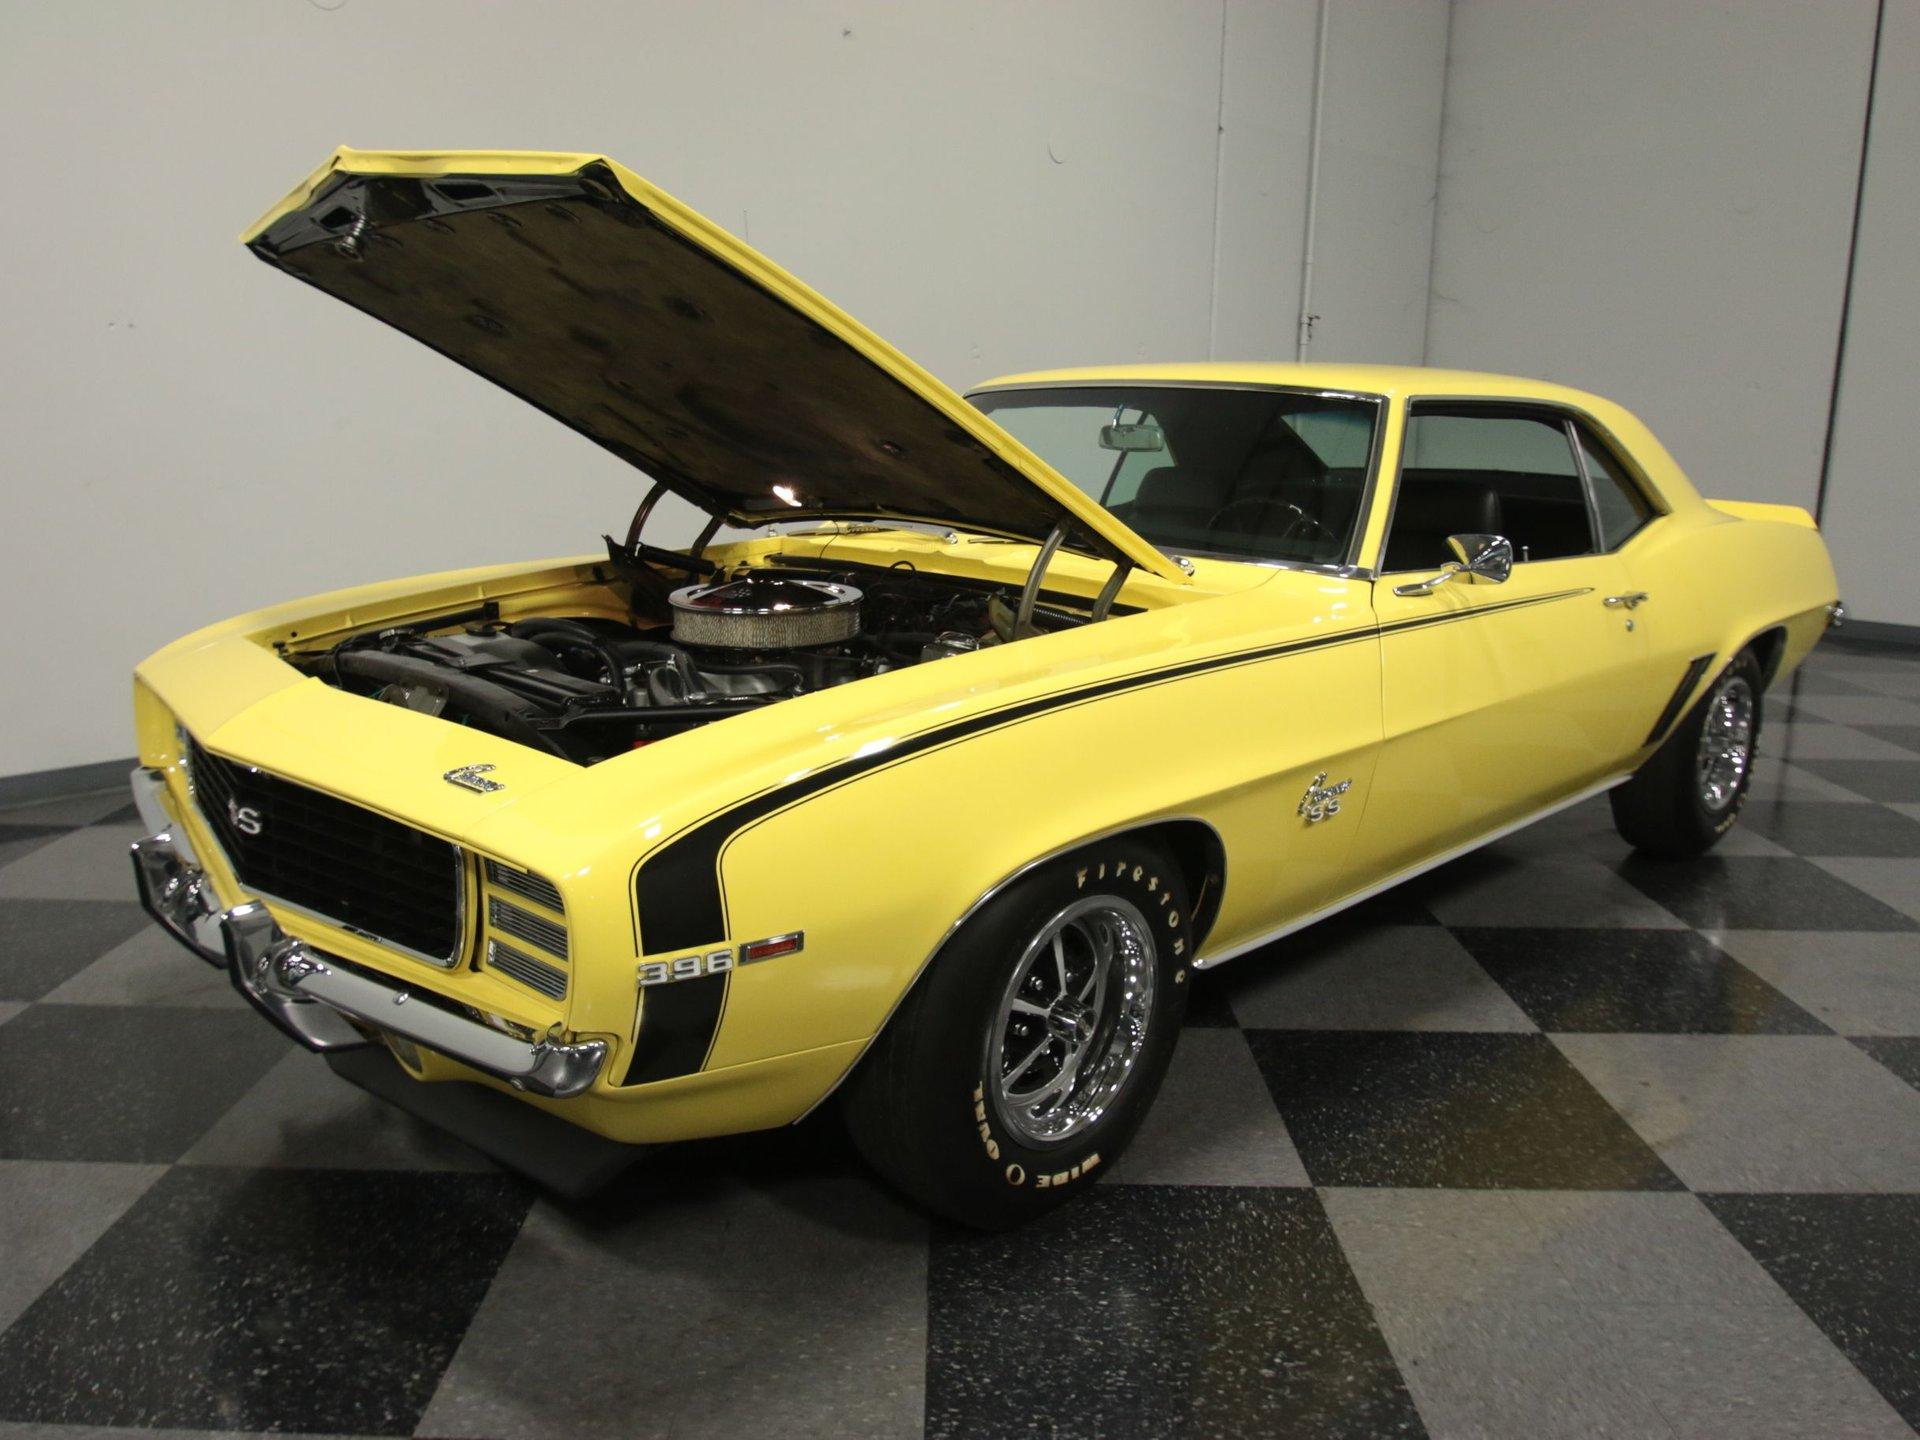 1969 Chevrolet Camaro | Streetside Classics - The Nation's Trusted